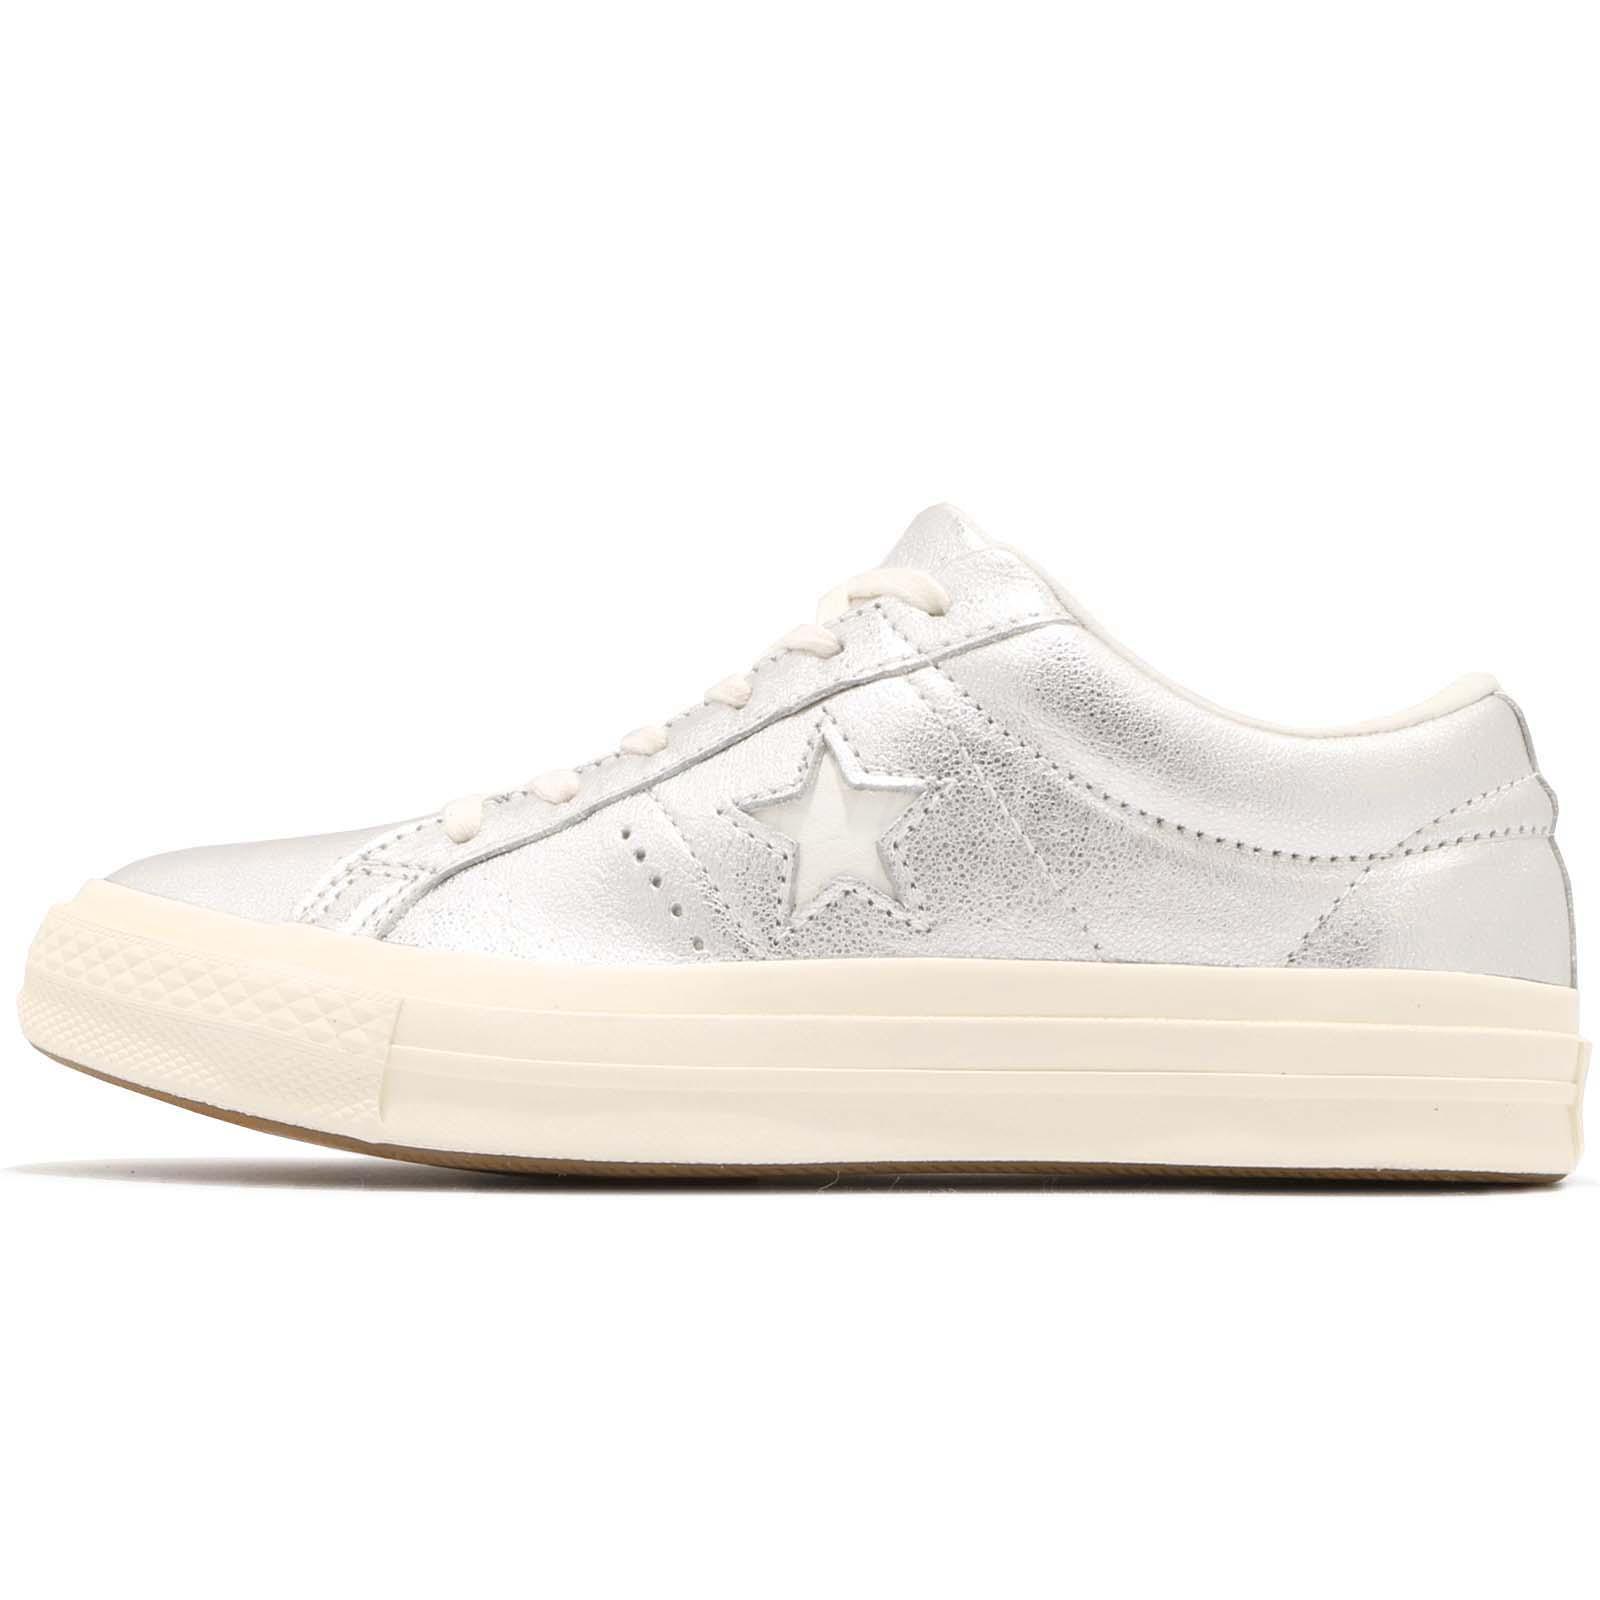 b31d70ea531 Converse One Star OX Silver White Men Women Casual Fashion Shoes Sneaker  161590C